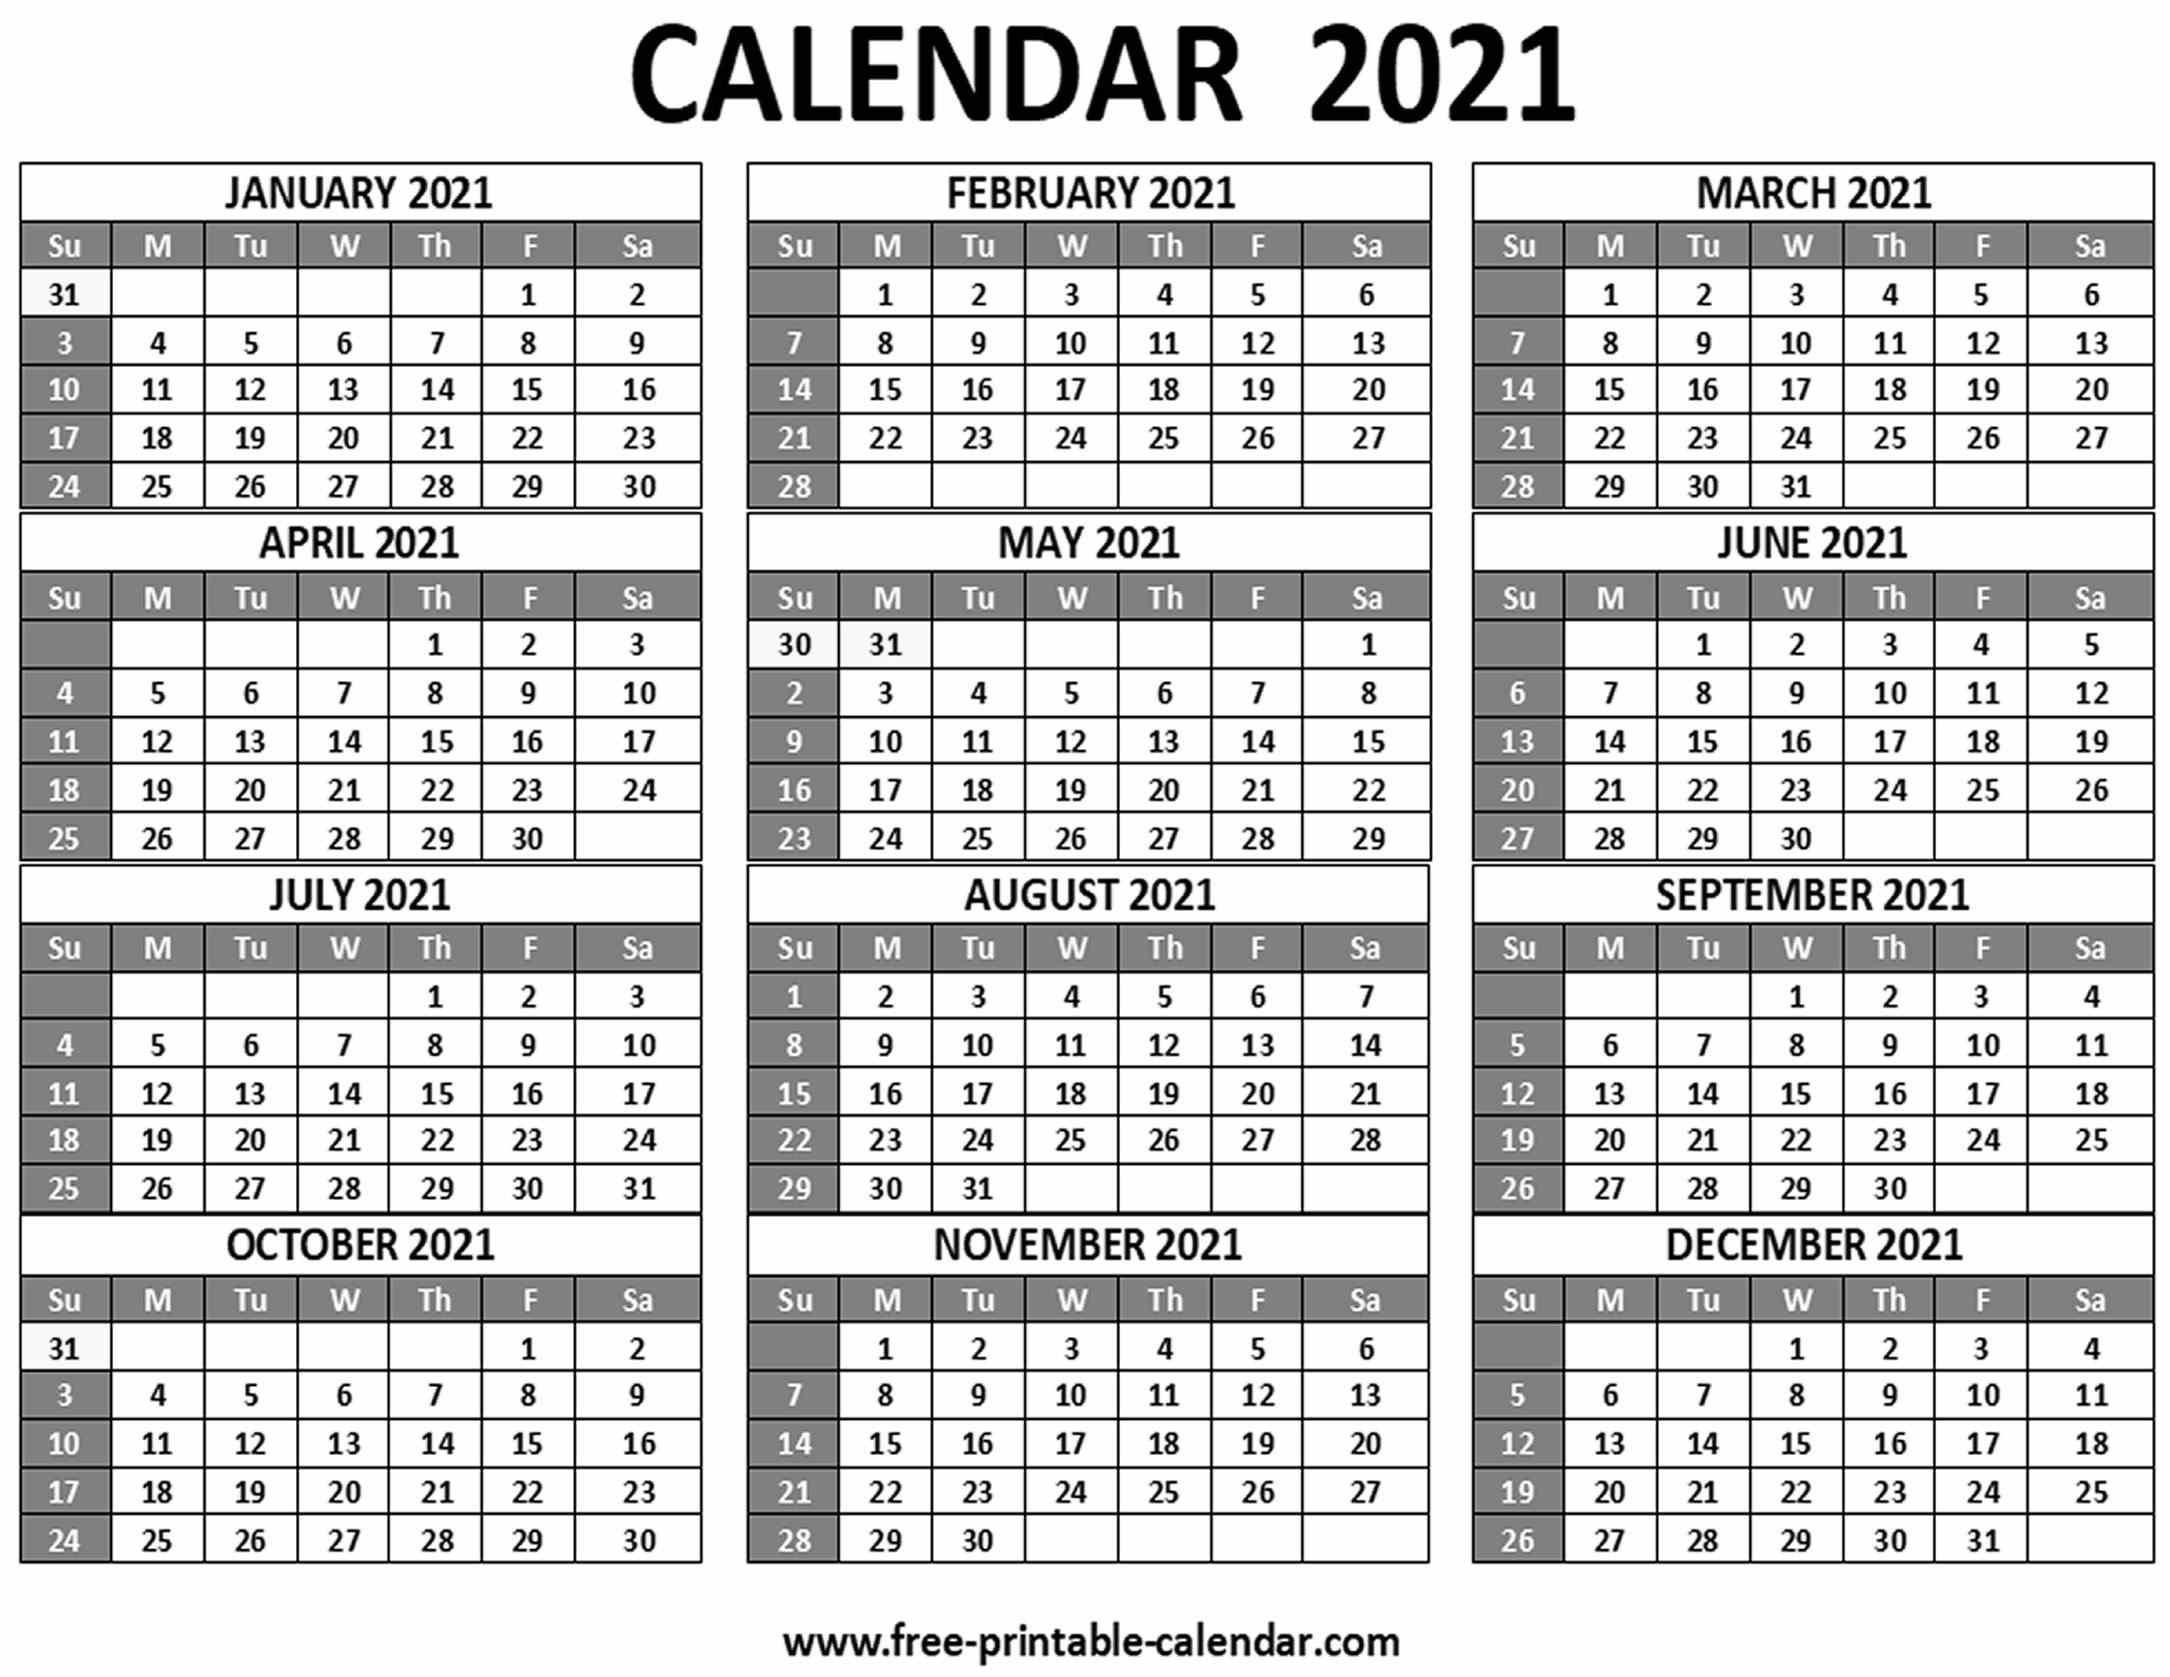 Printable 2021 Calendar - Free-Printable-Calendar-Free Monthly Calendar Printable 2021